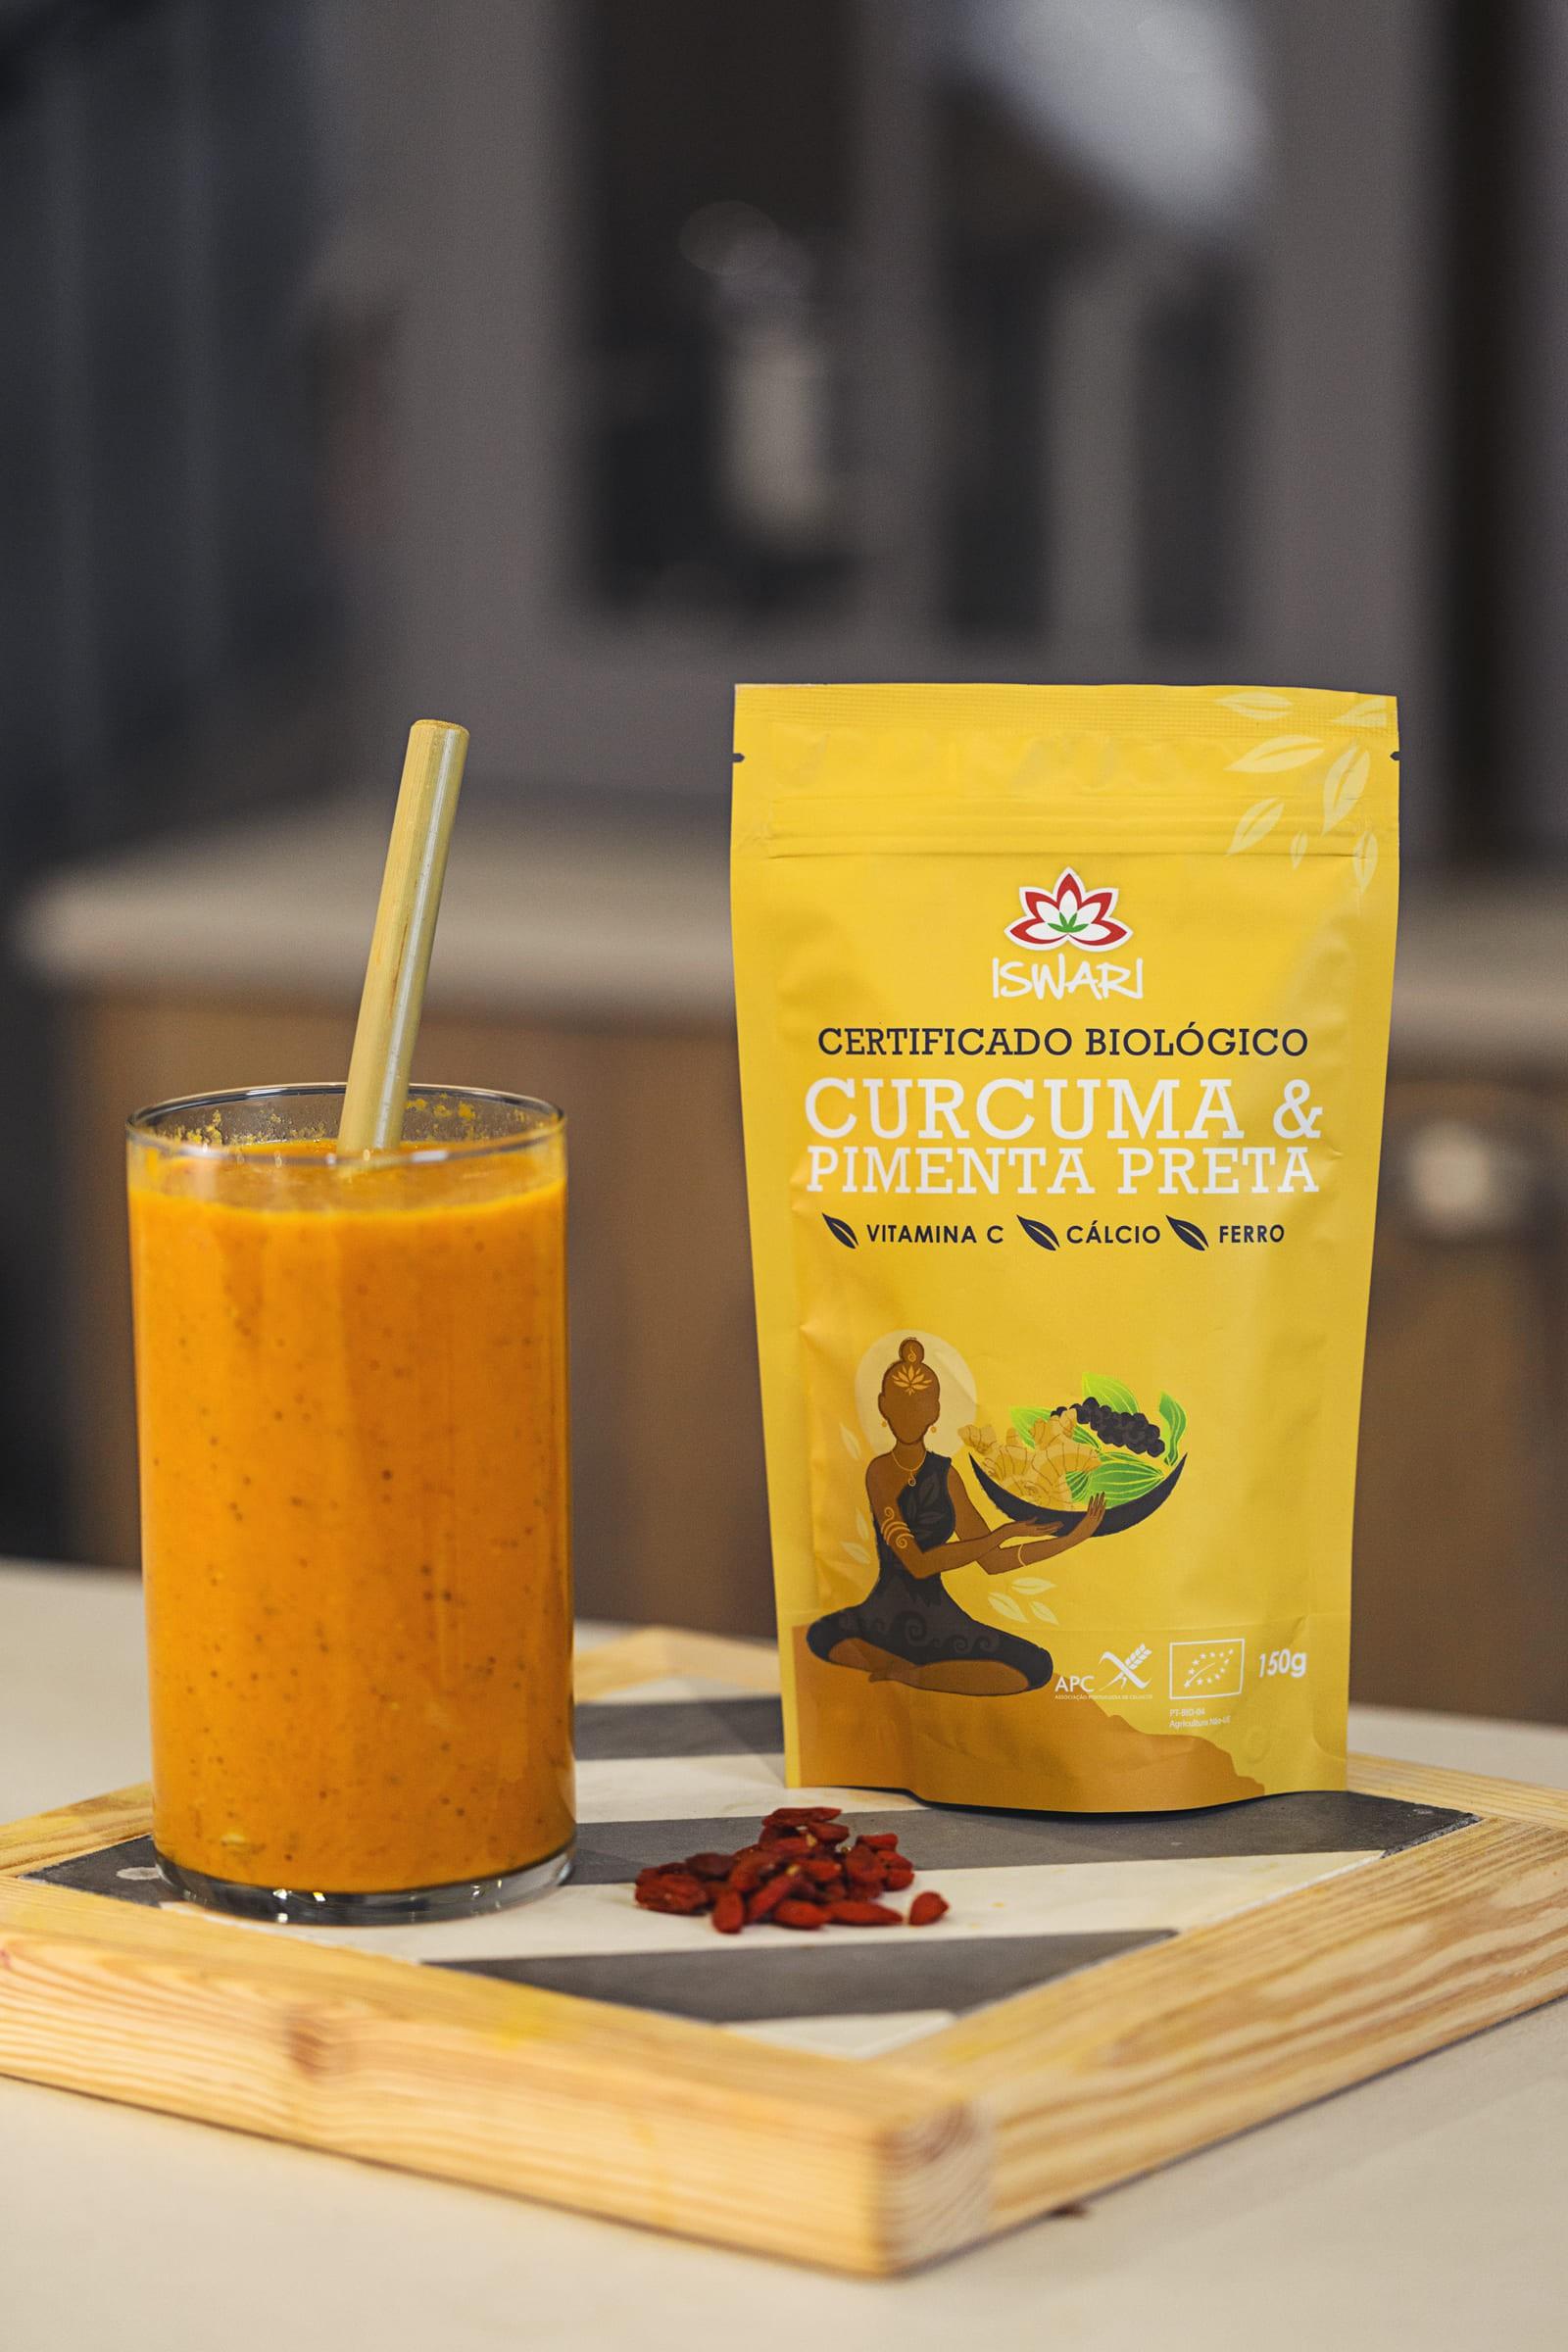 Curcuma & Pimenta Preta 4